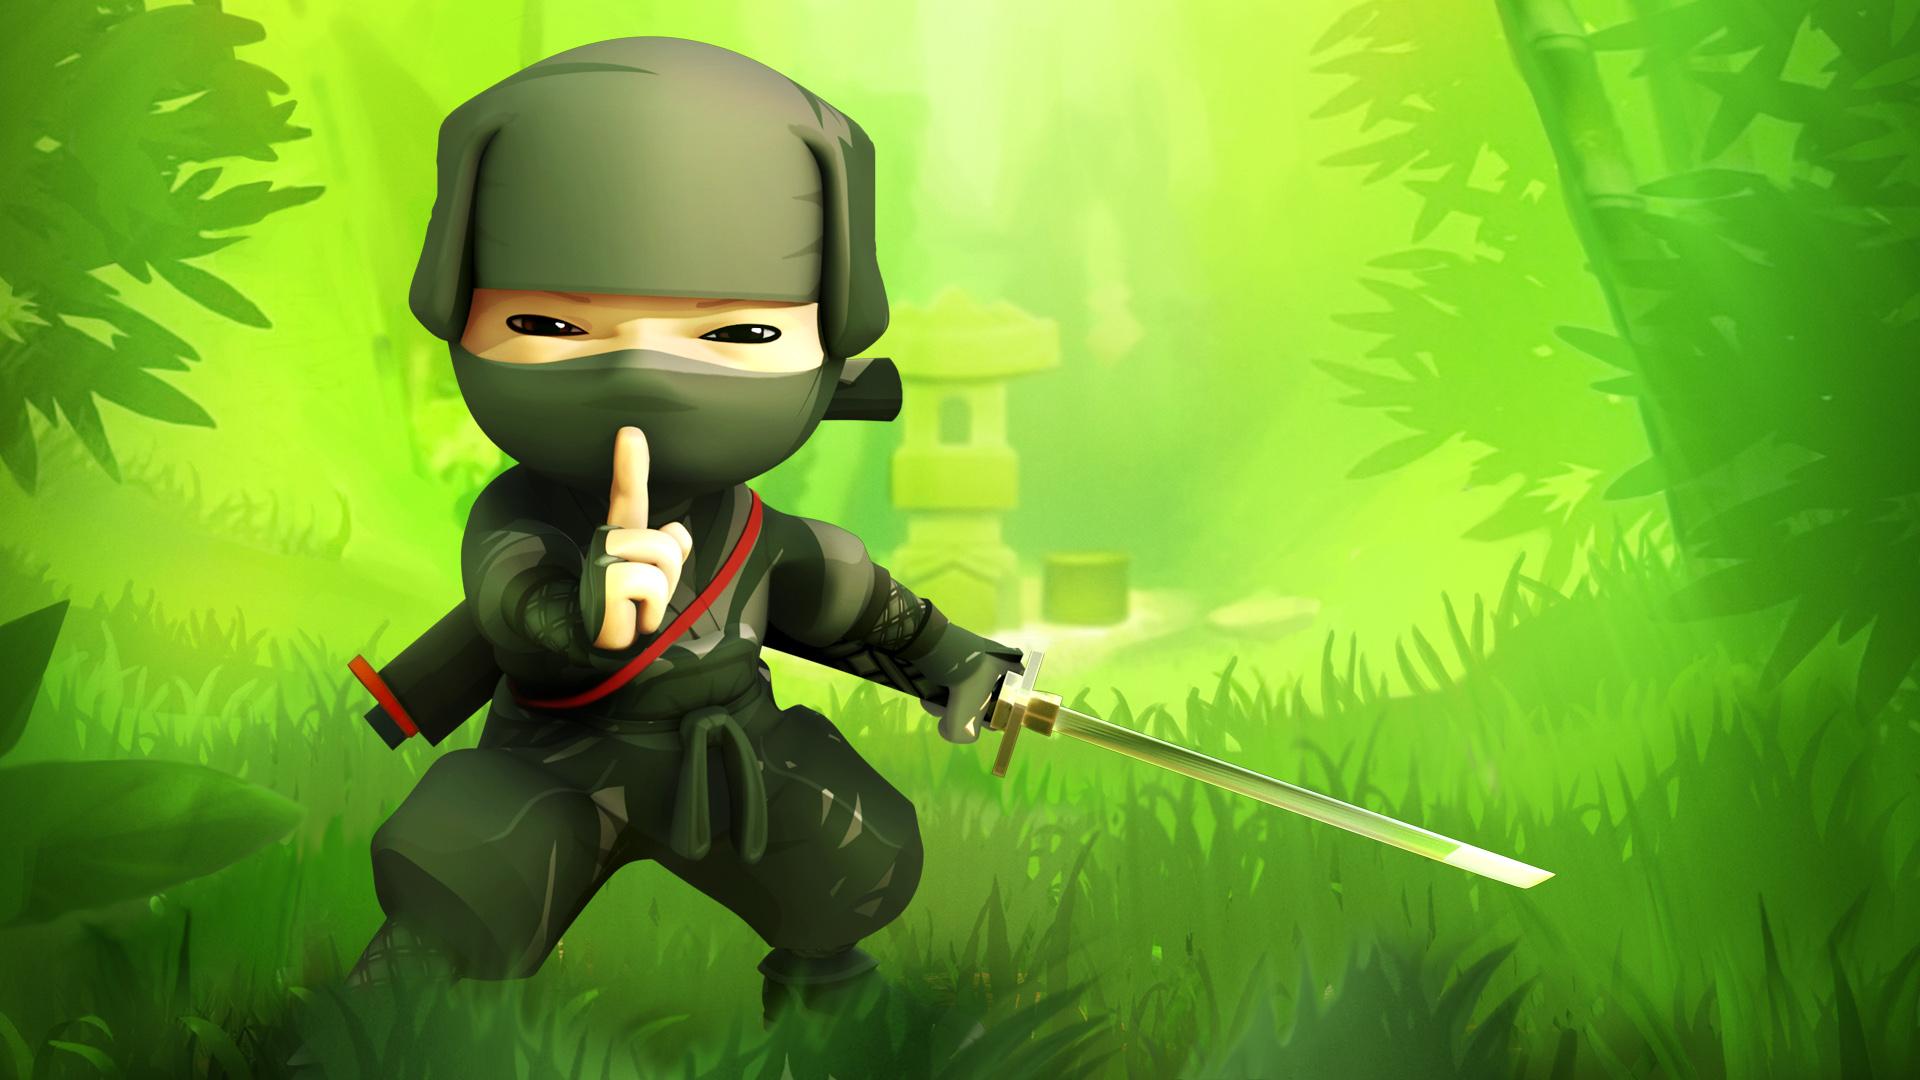 Mini Ninjas  Nintendo Wii, PS3, Xbox360. IO Interactive 2009